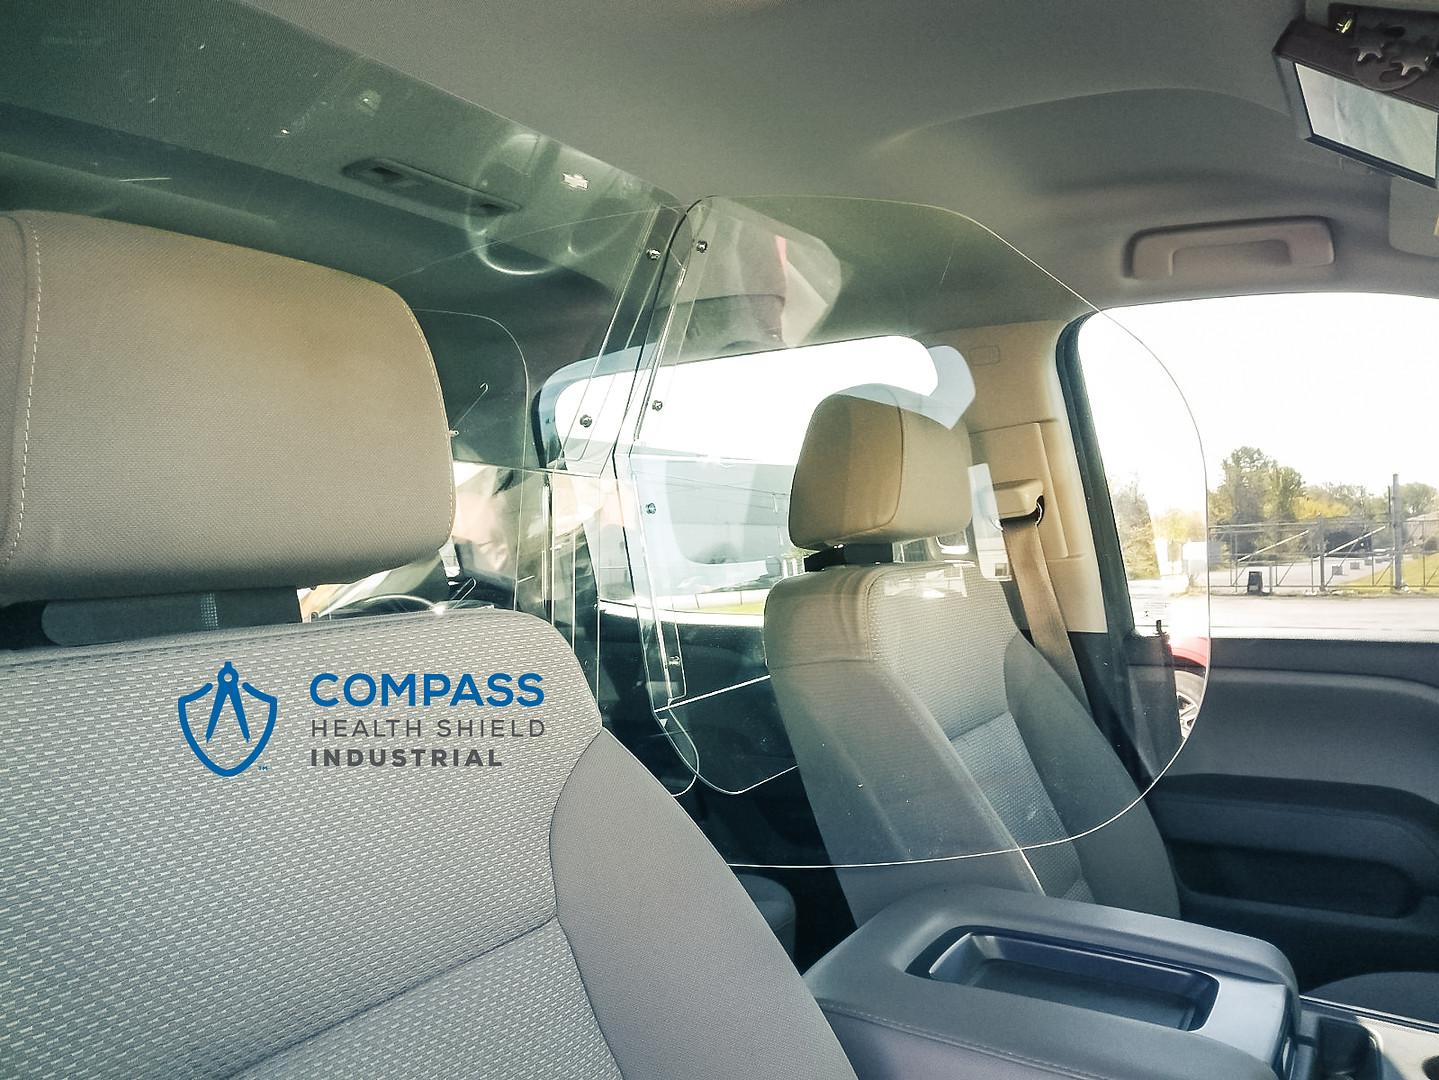 f150 front seat (1).jpg